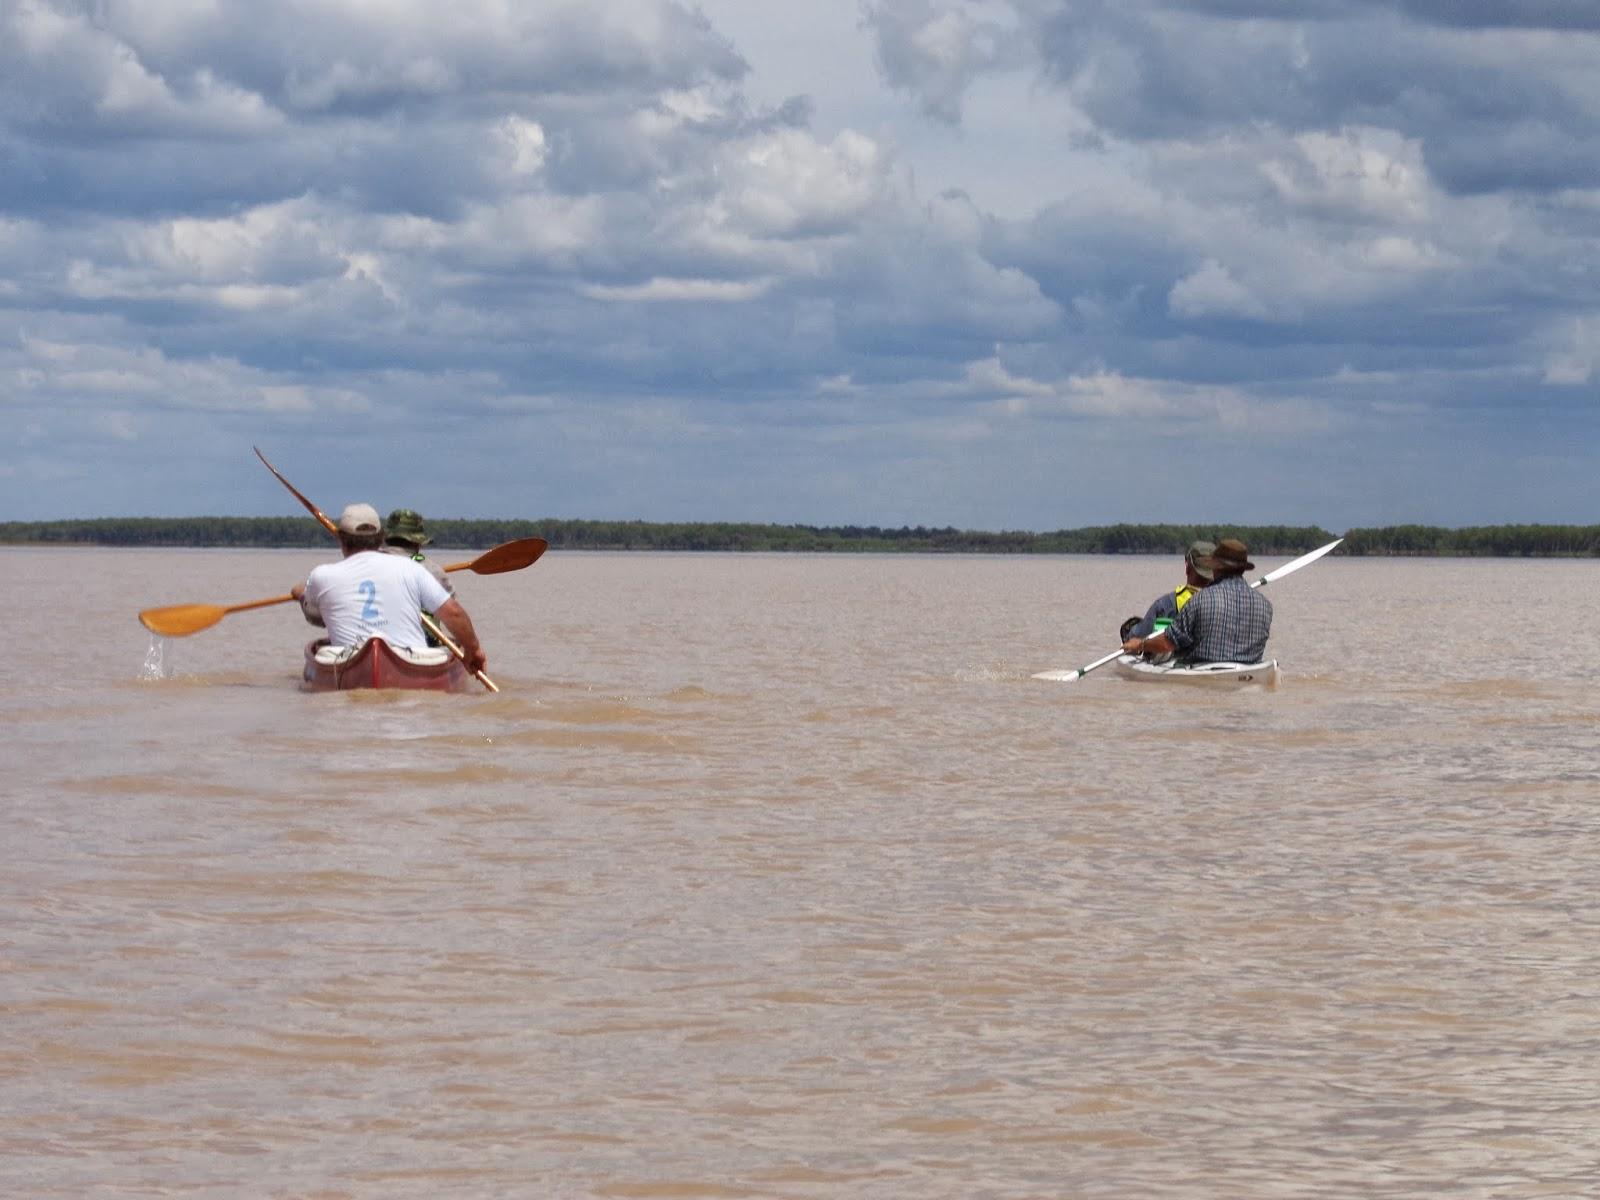 BAJADA DEL PARANA 2014 de Diamate a Rosario,, 96 km de alegria DSC01684